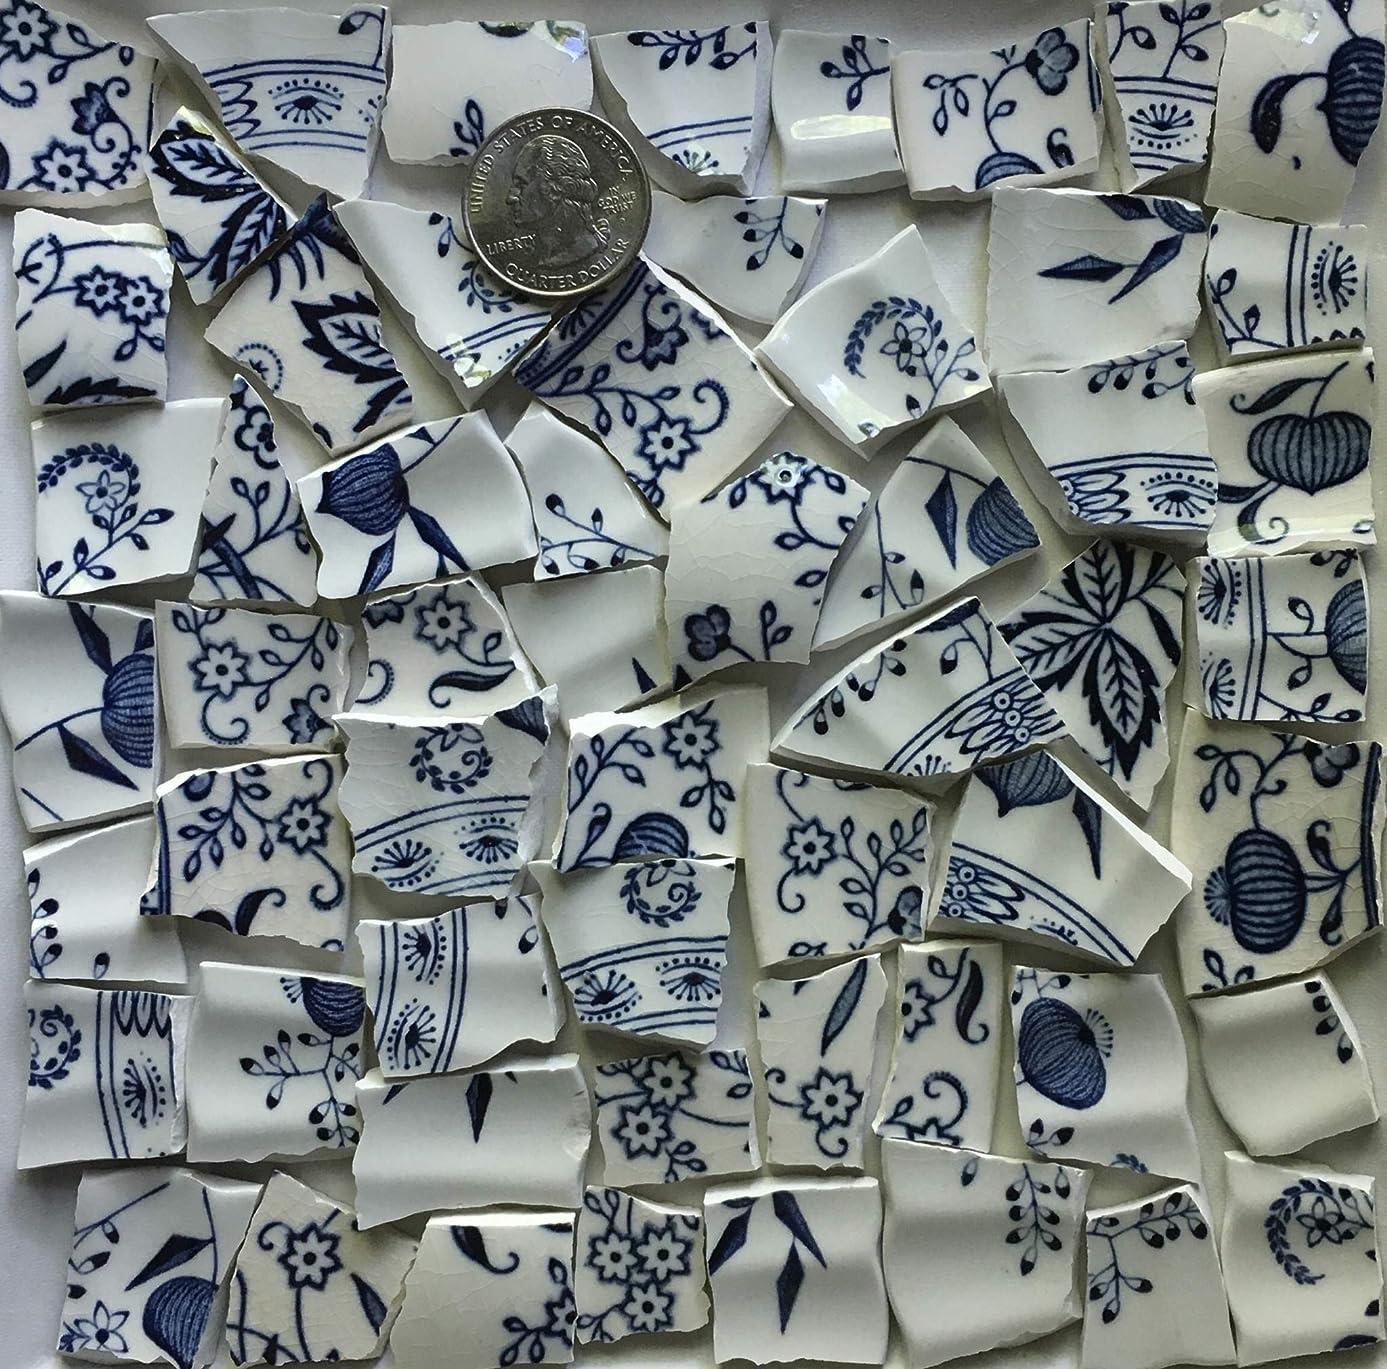 Mosaic Art & Crafts Supply ~ Classic Vintage Blue & White China Tiles (B584)